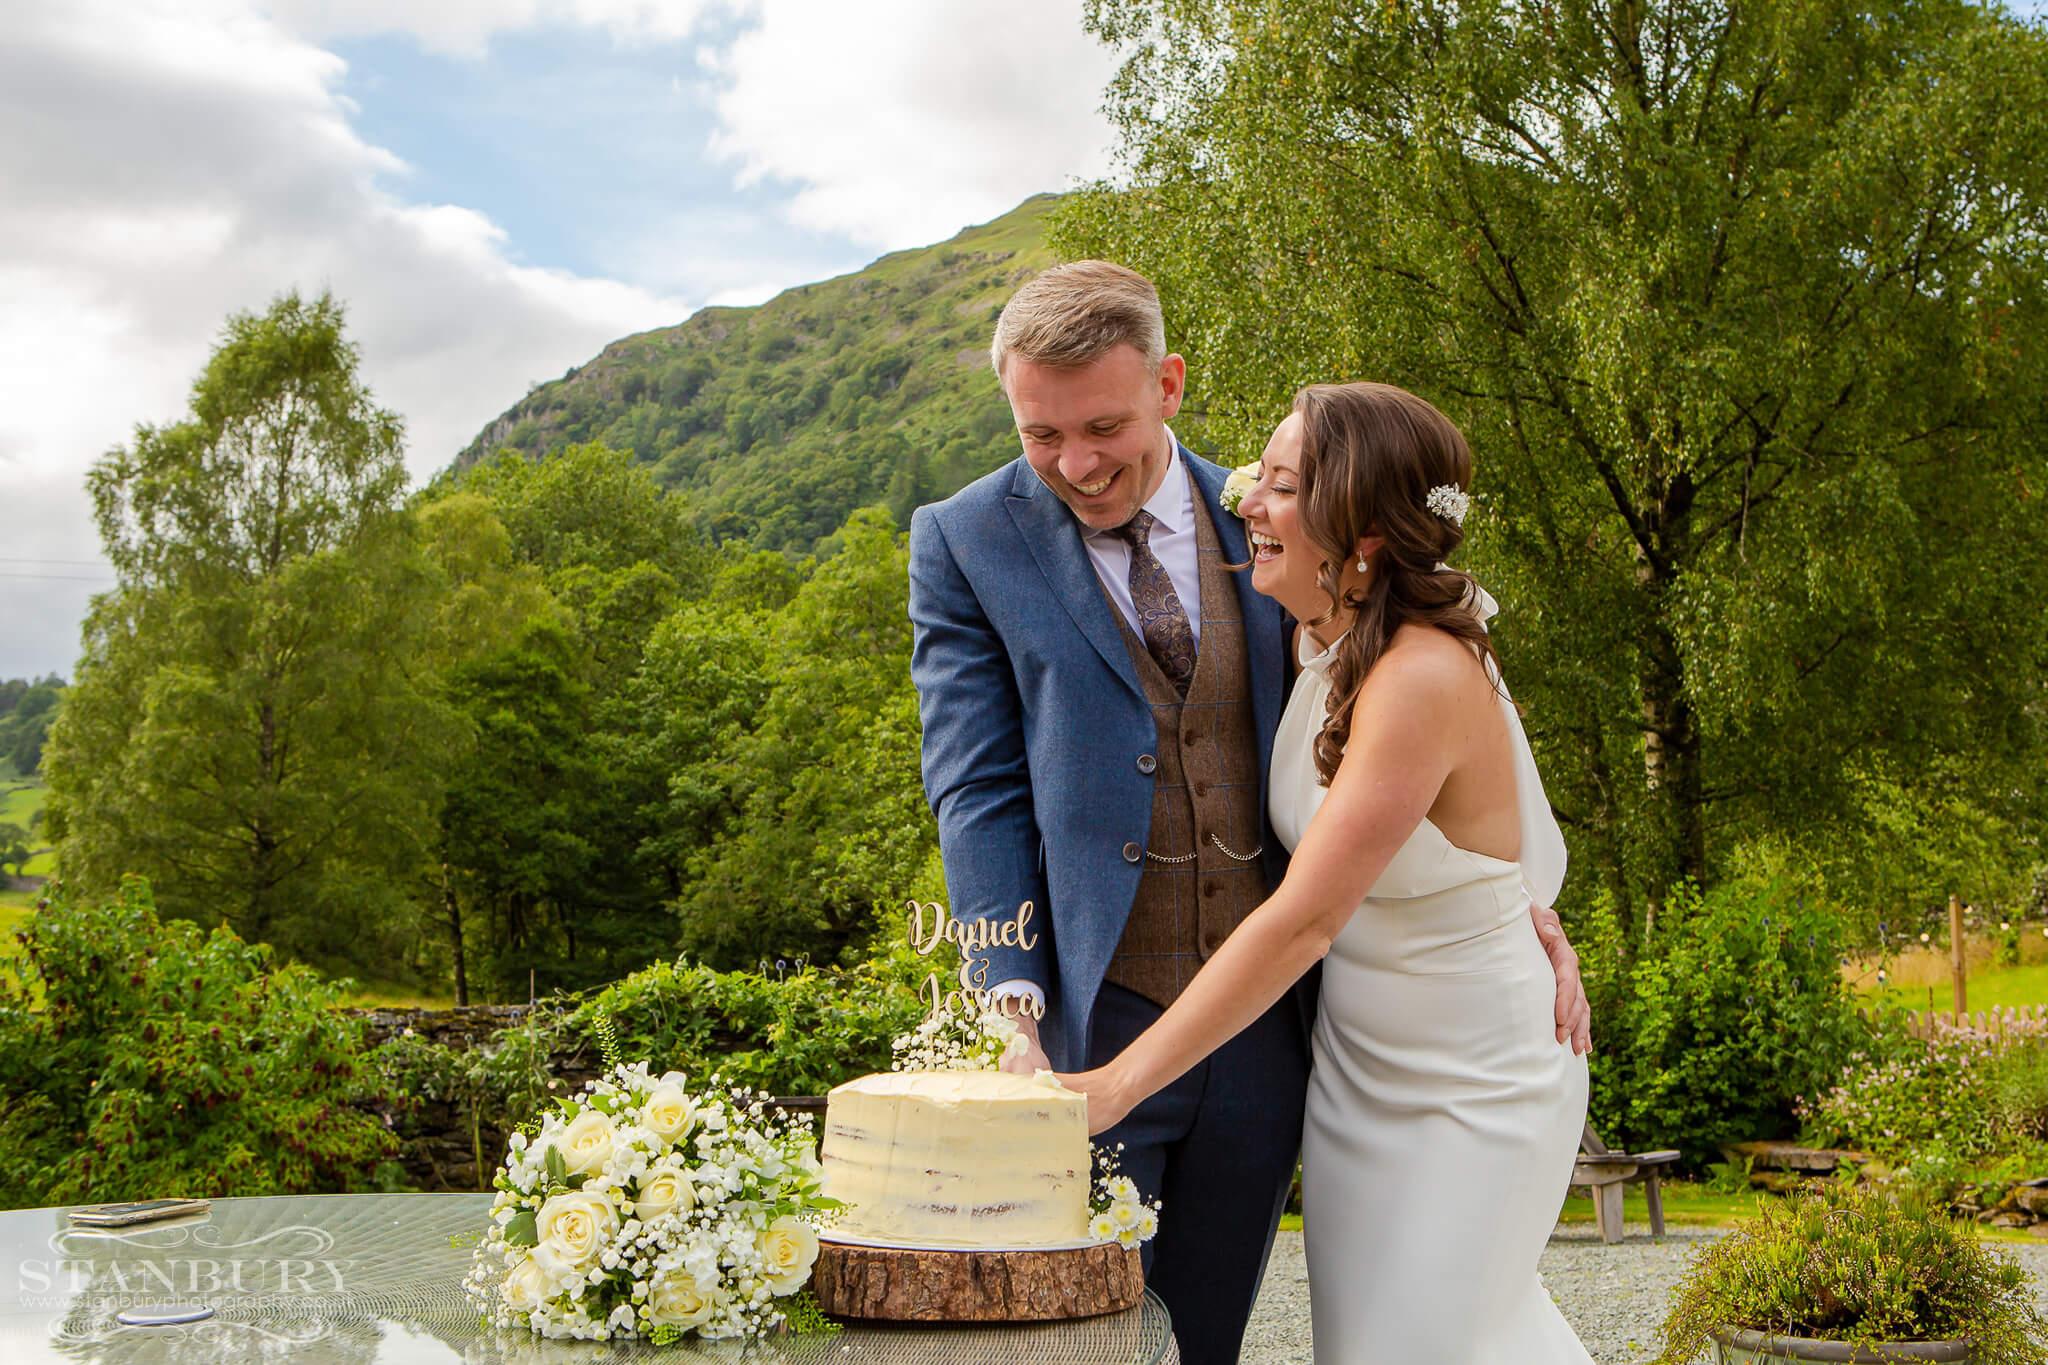 wedding-cut-cake-lake-district-photography